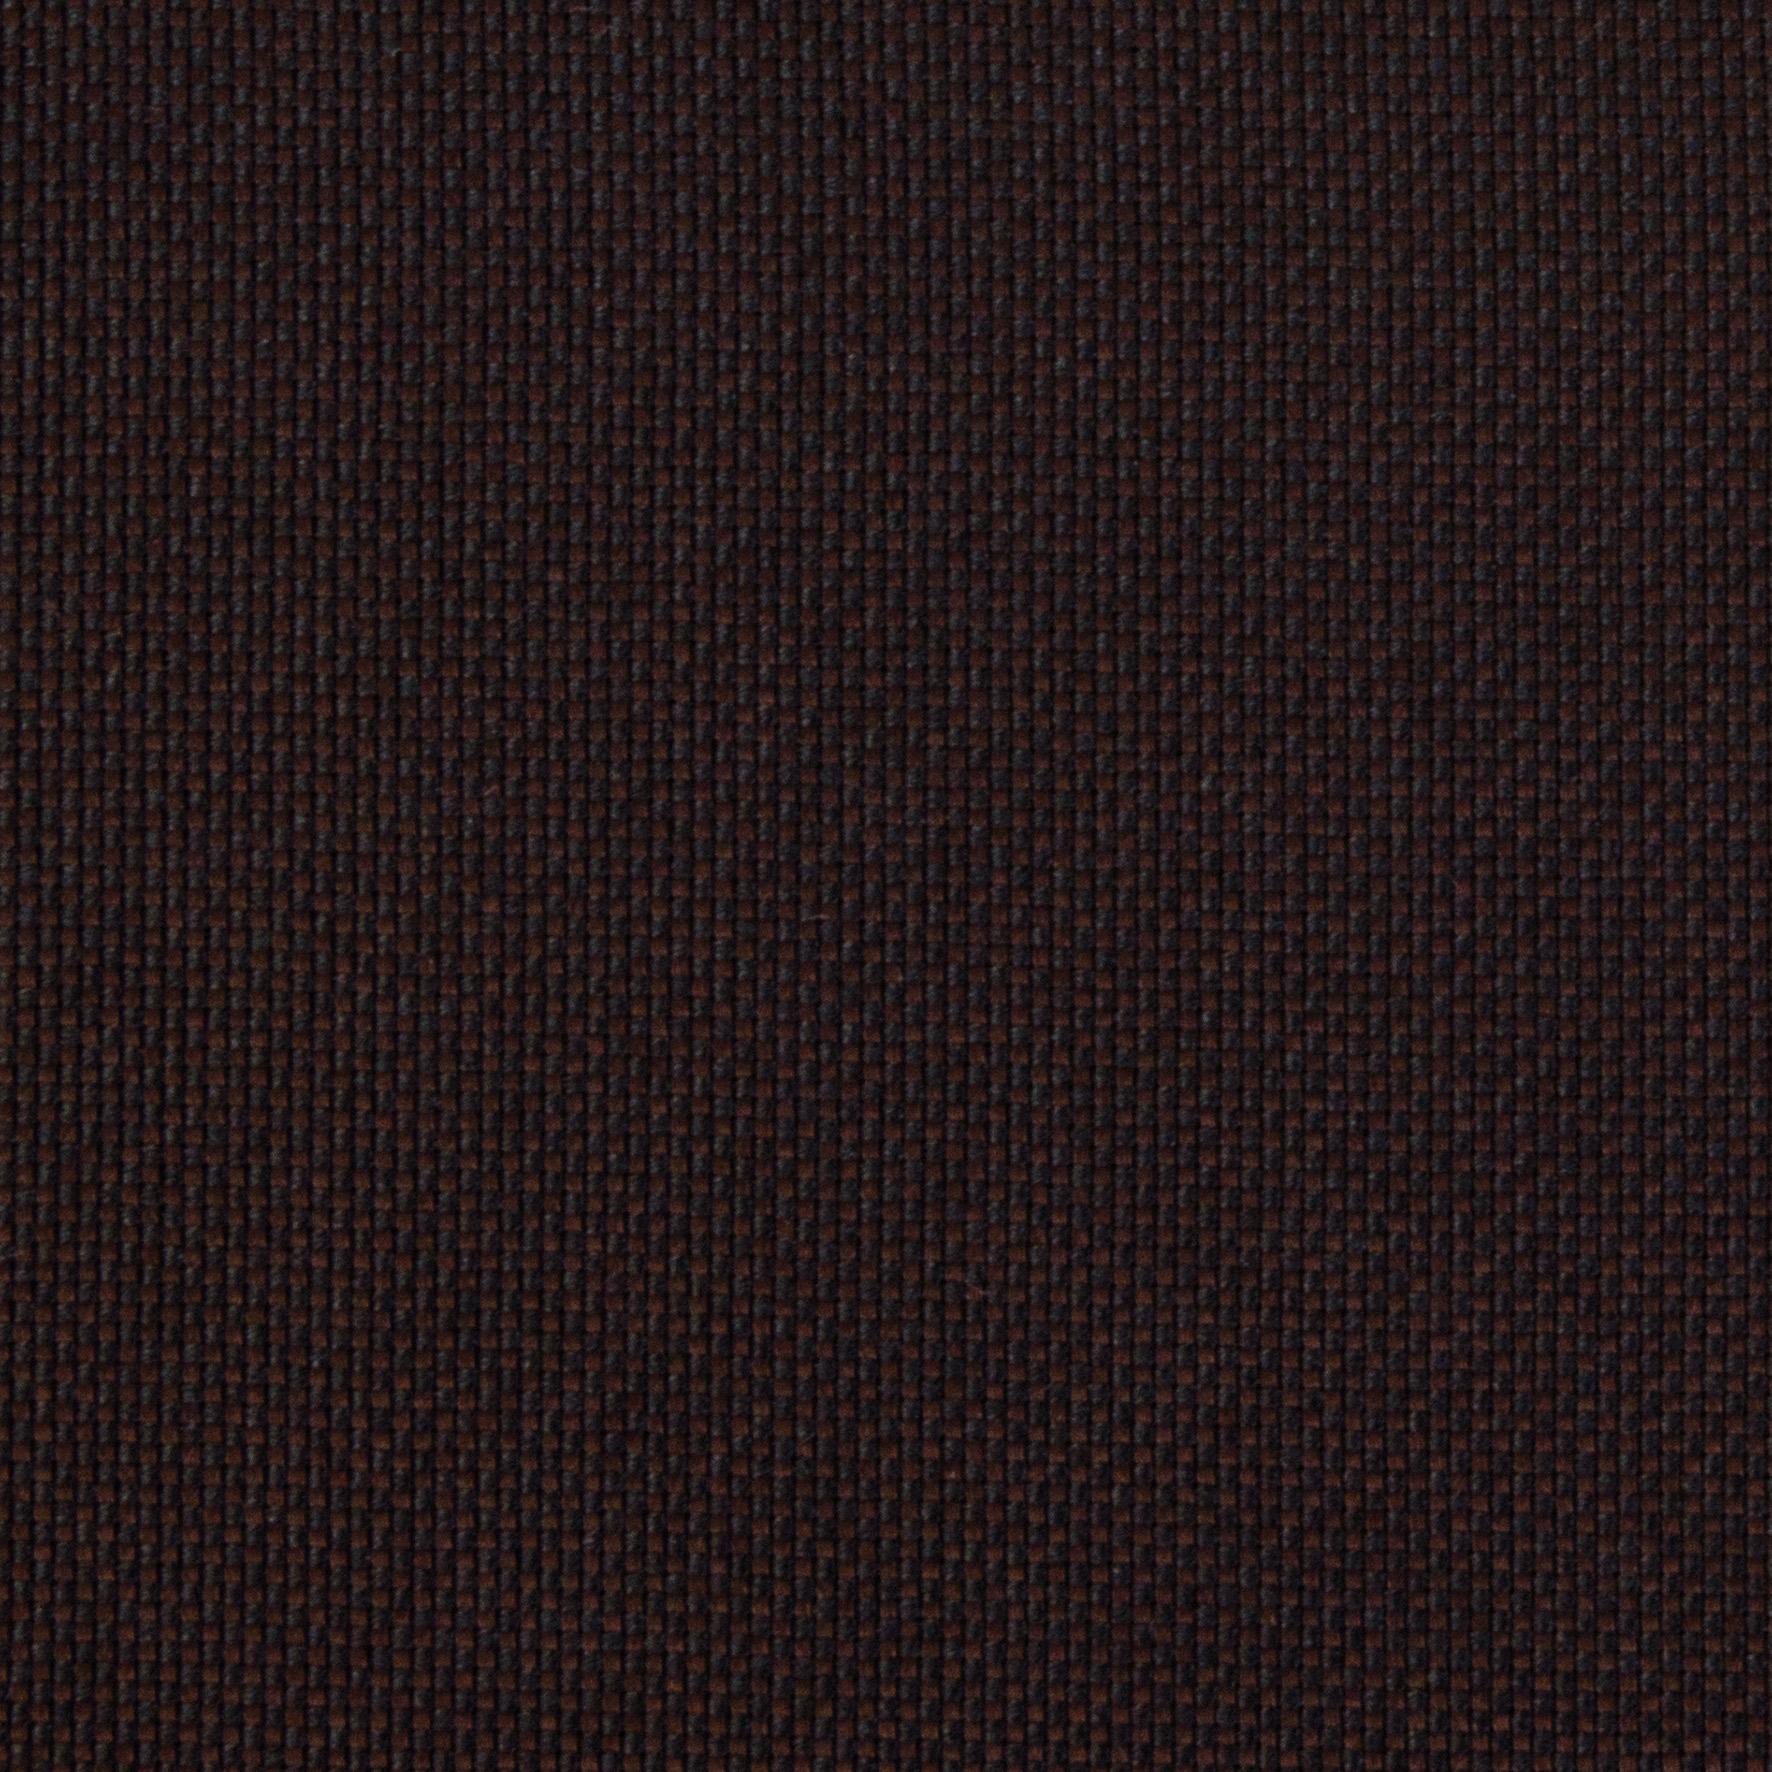 Buy tailor made shirts online - Antonio Range - Brown Diamond Weave